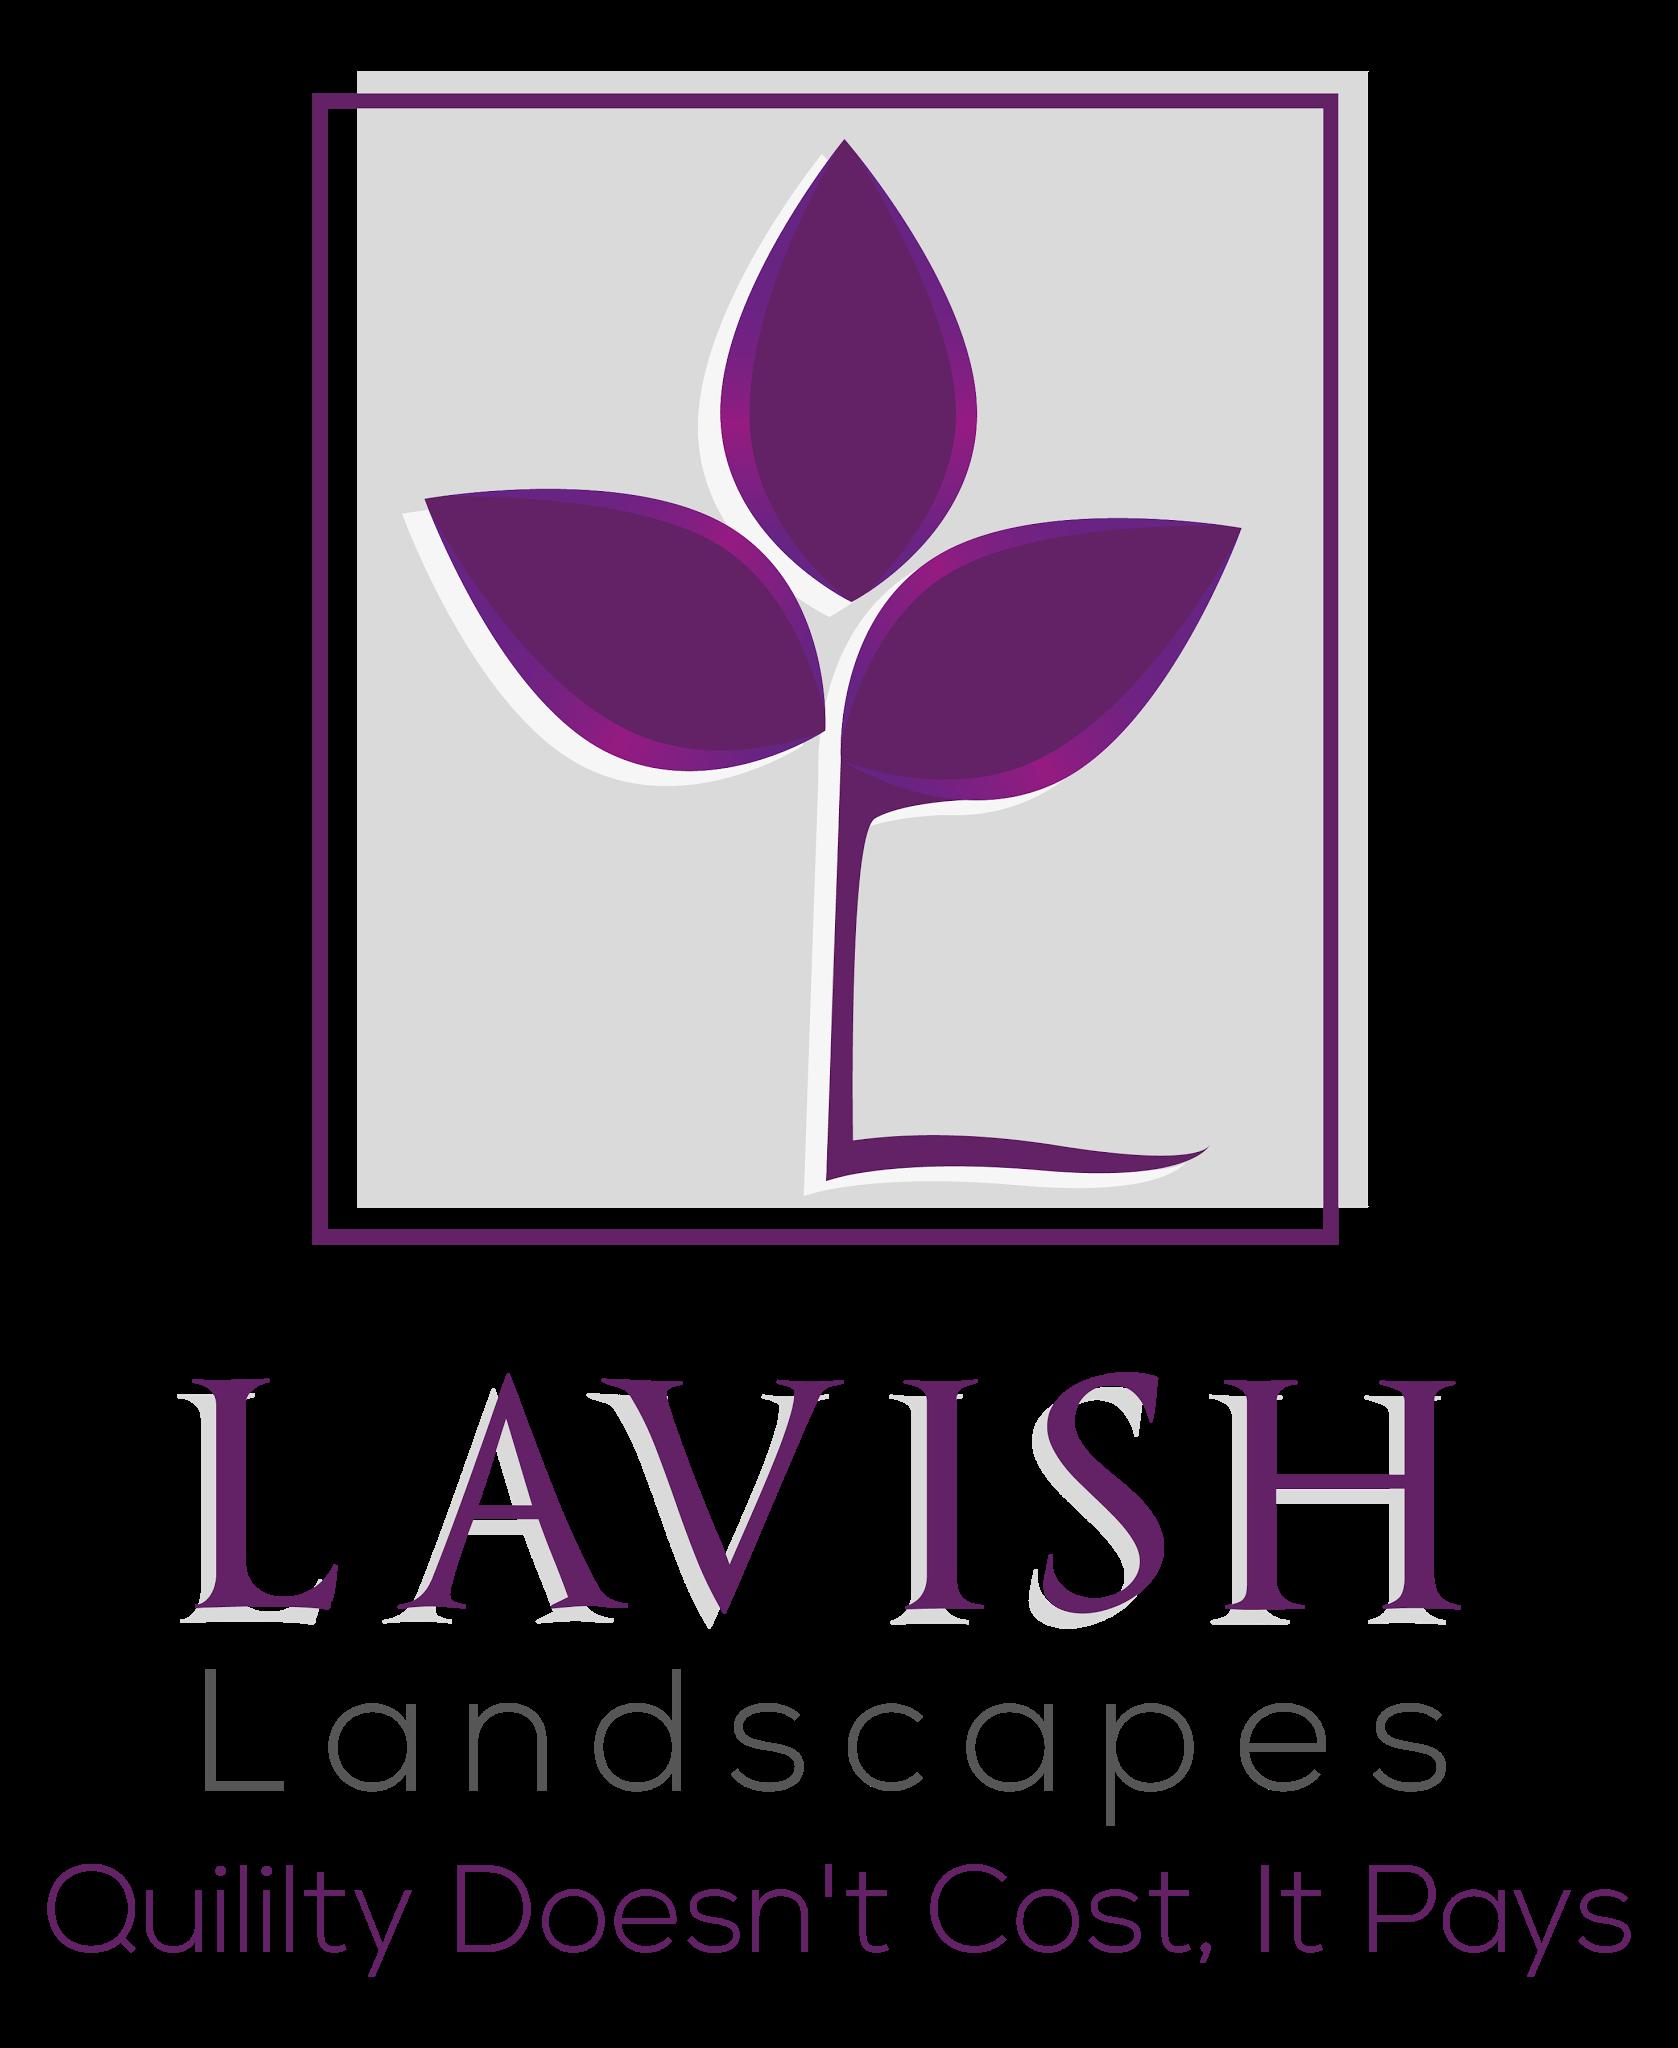 Lavish Landscapes